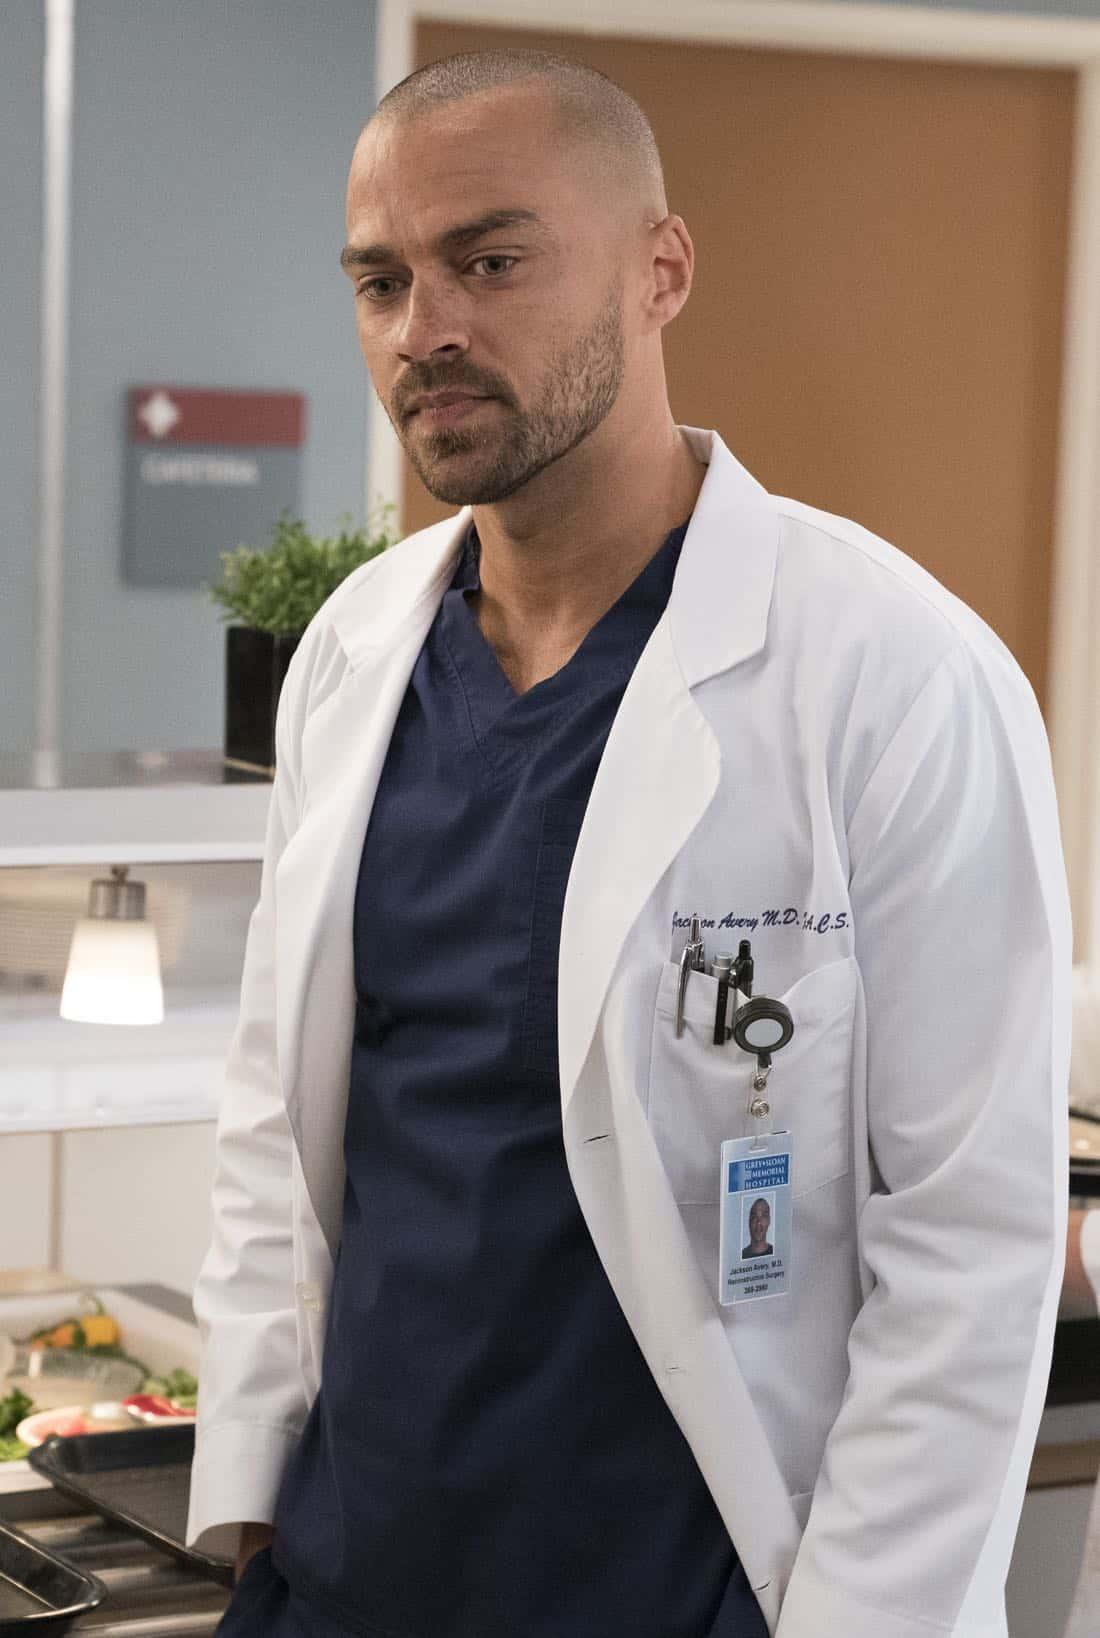 Greys Anatomy Episode 13 Season 14 You Really Got a Hold on Me 07